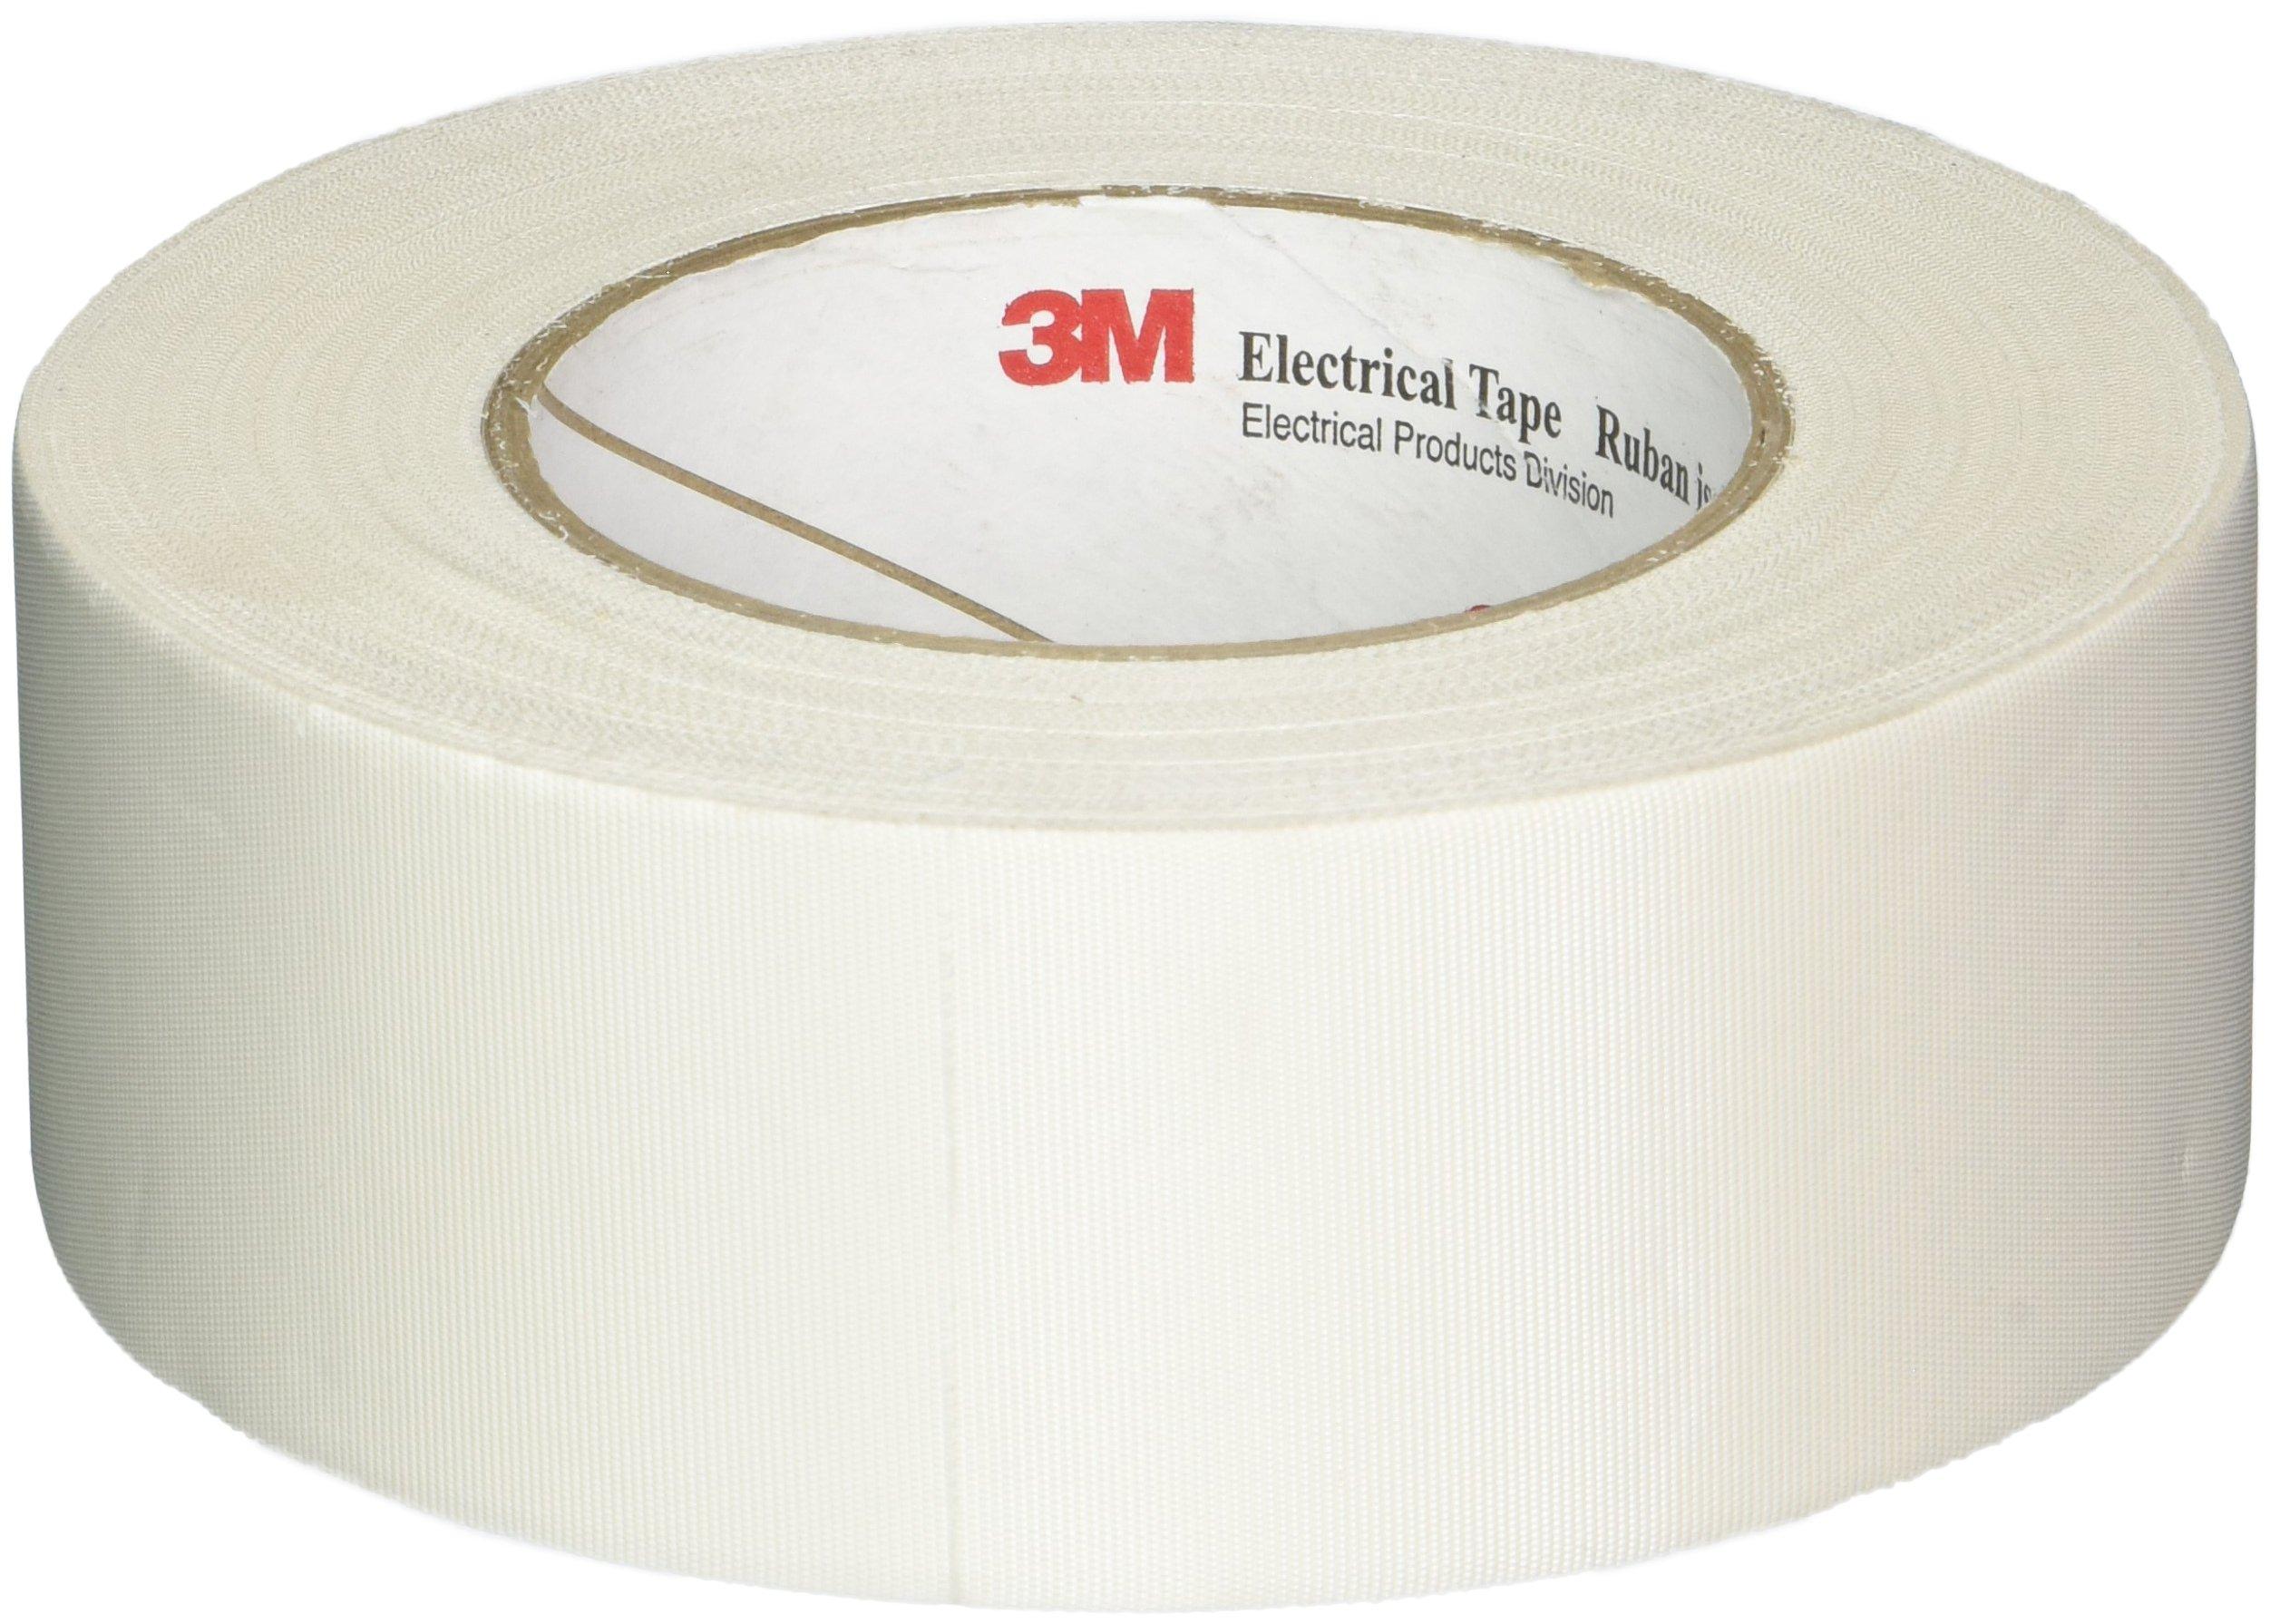 3M 27 Cloth Electrical Tape, 2'' Width x 60yd Length (1 roll)